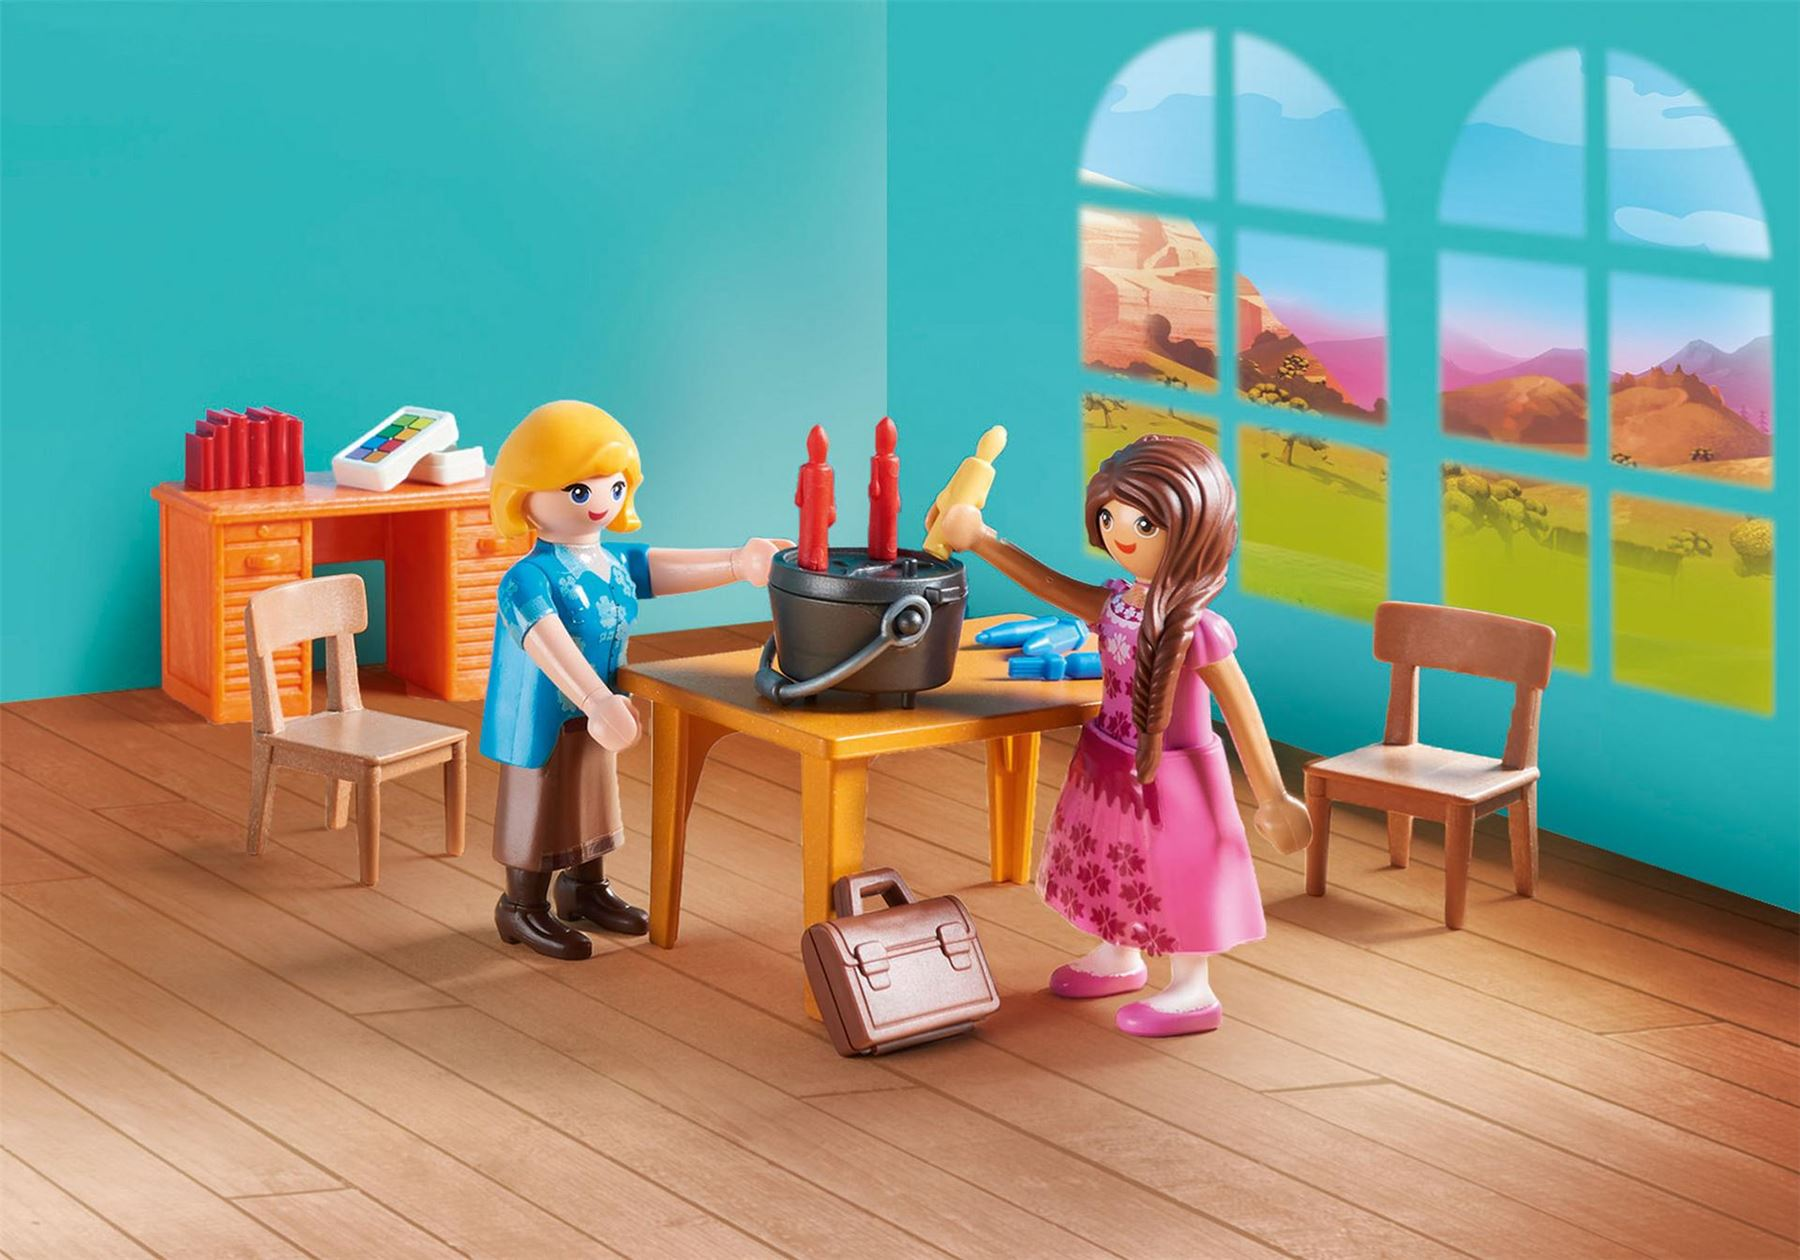 Barn Vaulting Solana /& More! Playmobil DreamWorks Spirit Sets Riding Arena